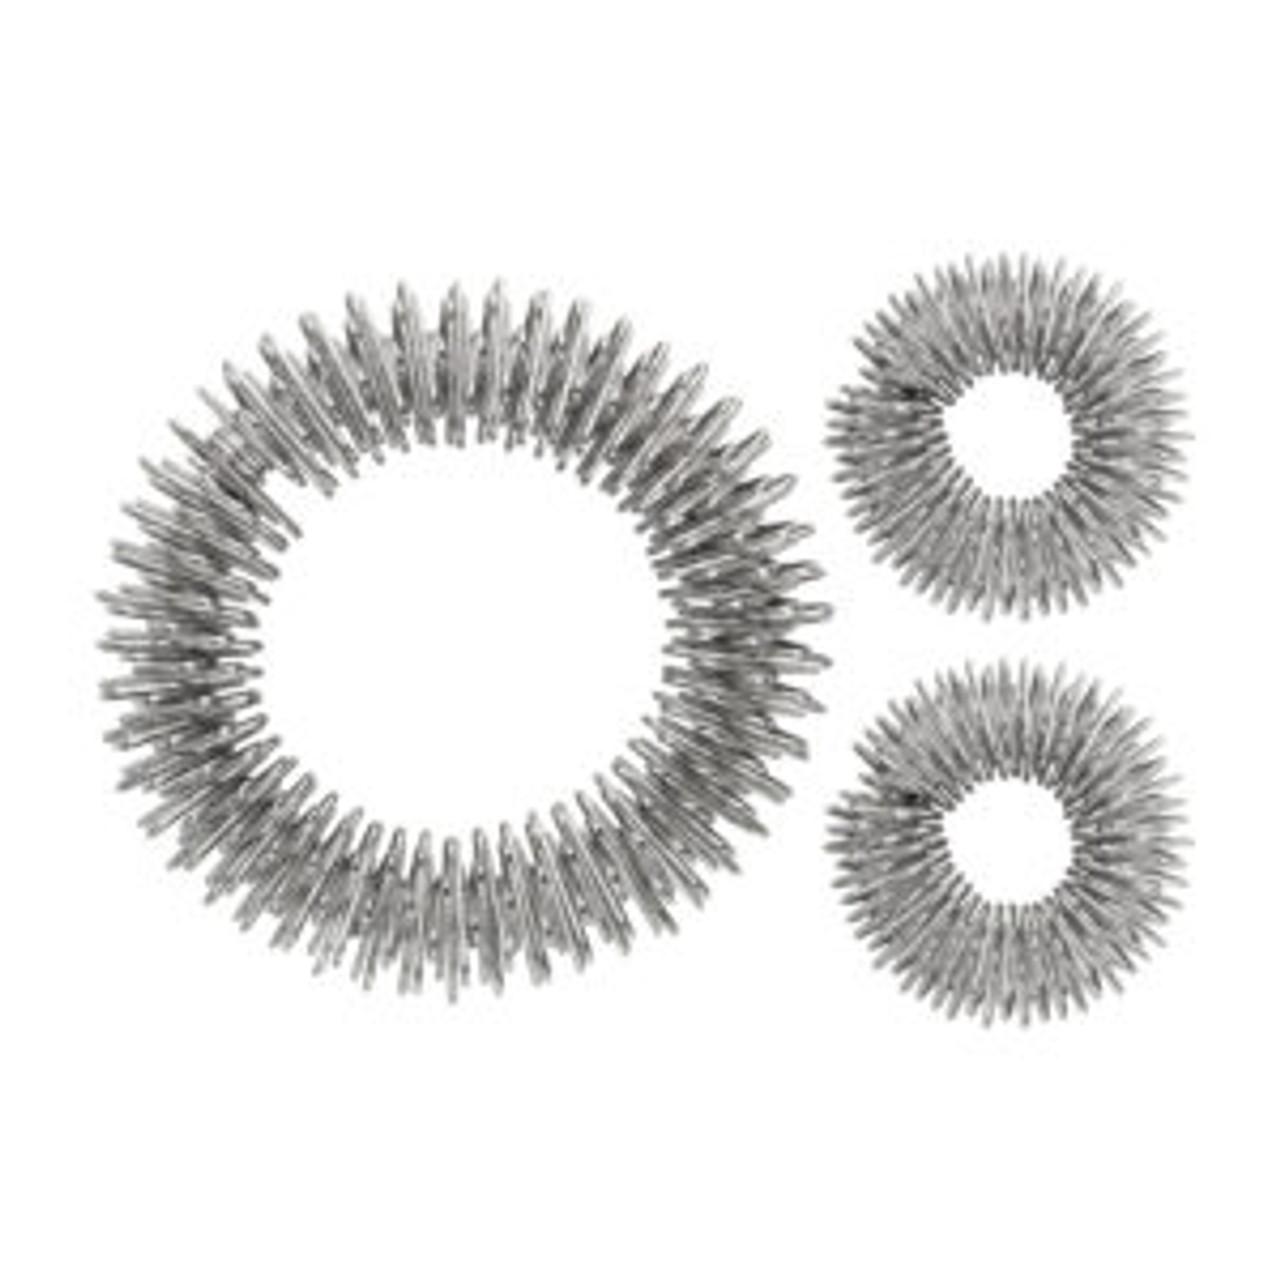 acupressure ring set lindo